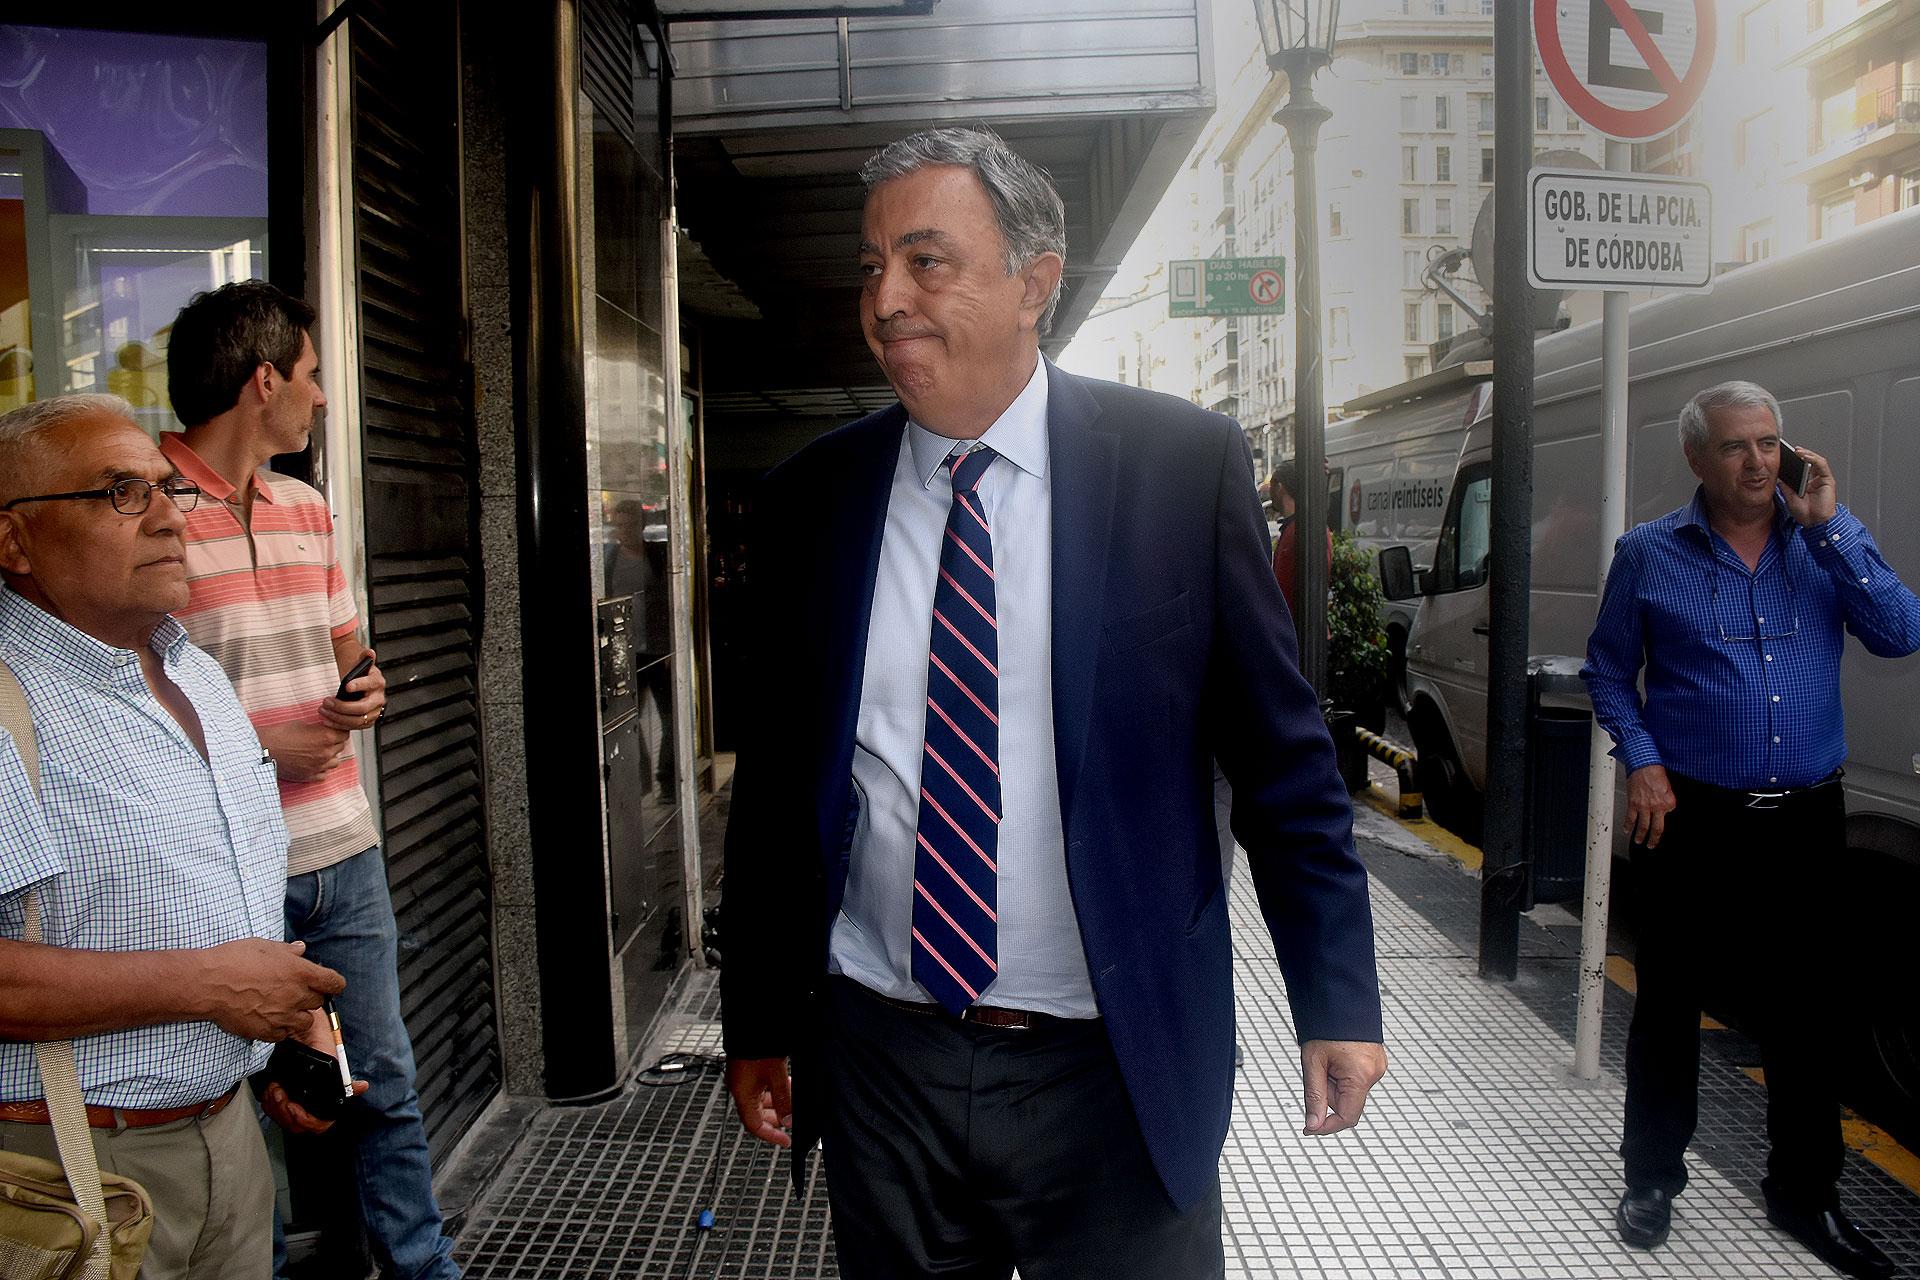 El senador salteño Rodolfo Urtubey